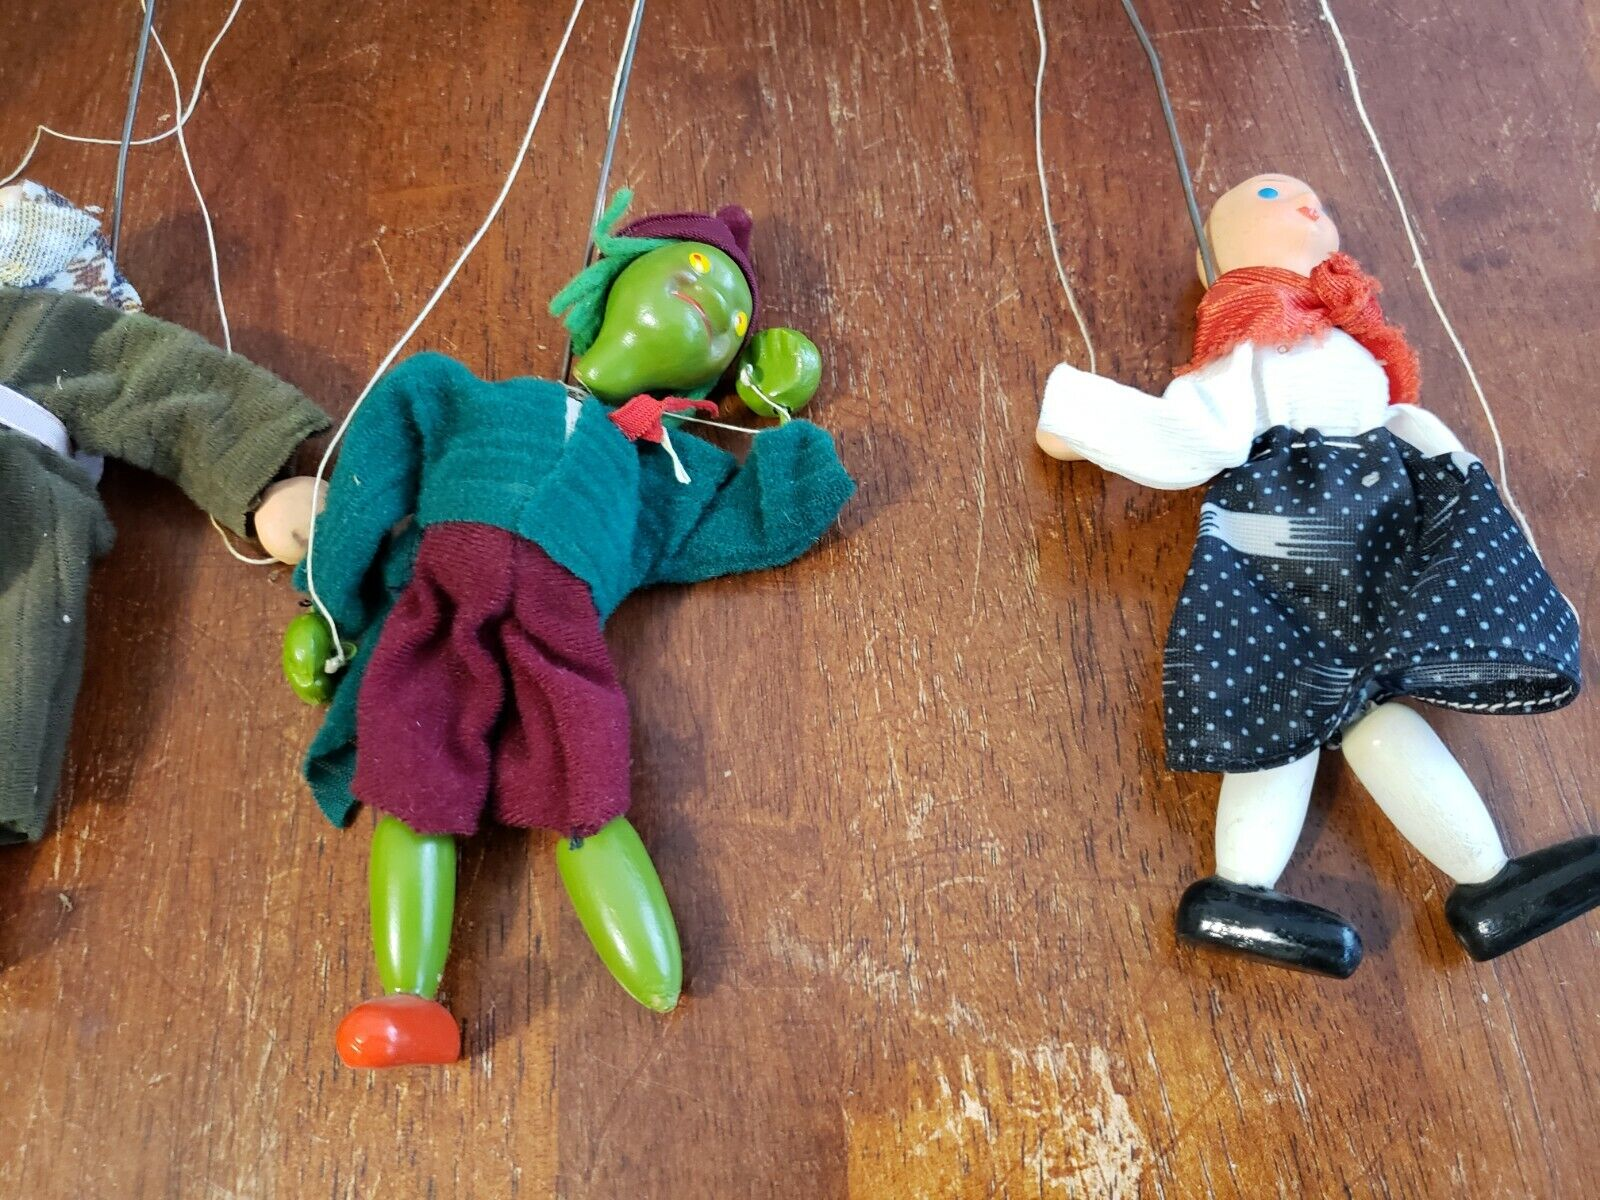 Vintage Fantasy Puppets marionette Theatre Theatre Theatre 3a0137